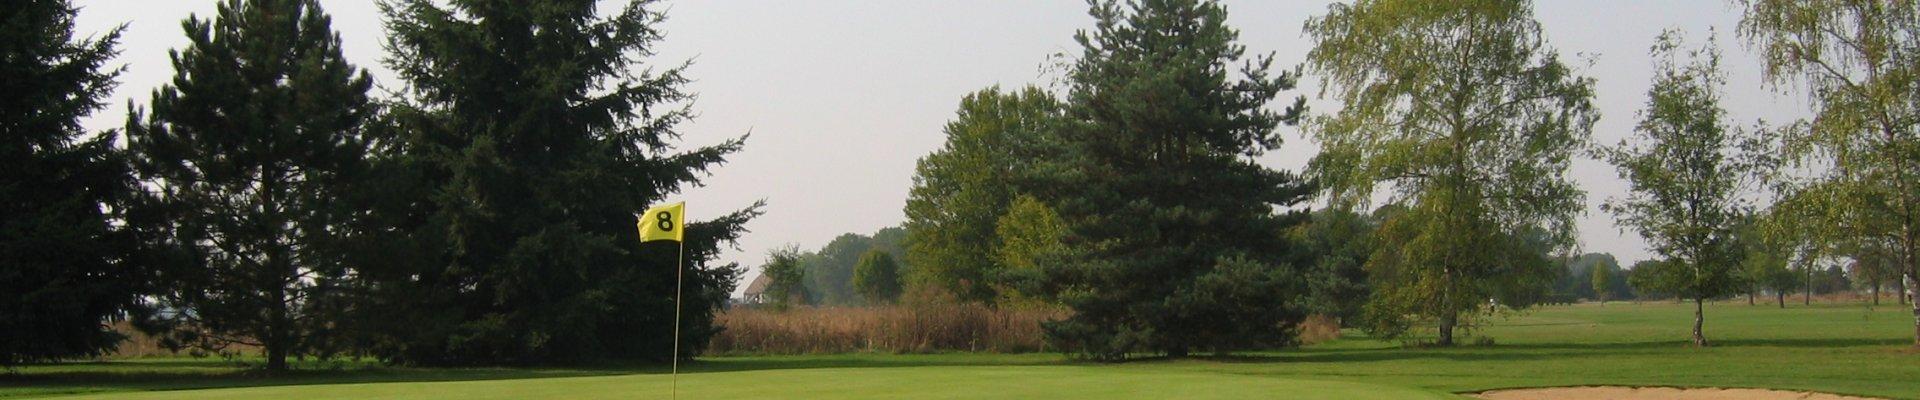 golf-de-villeray.jpg